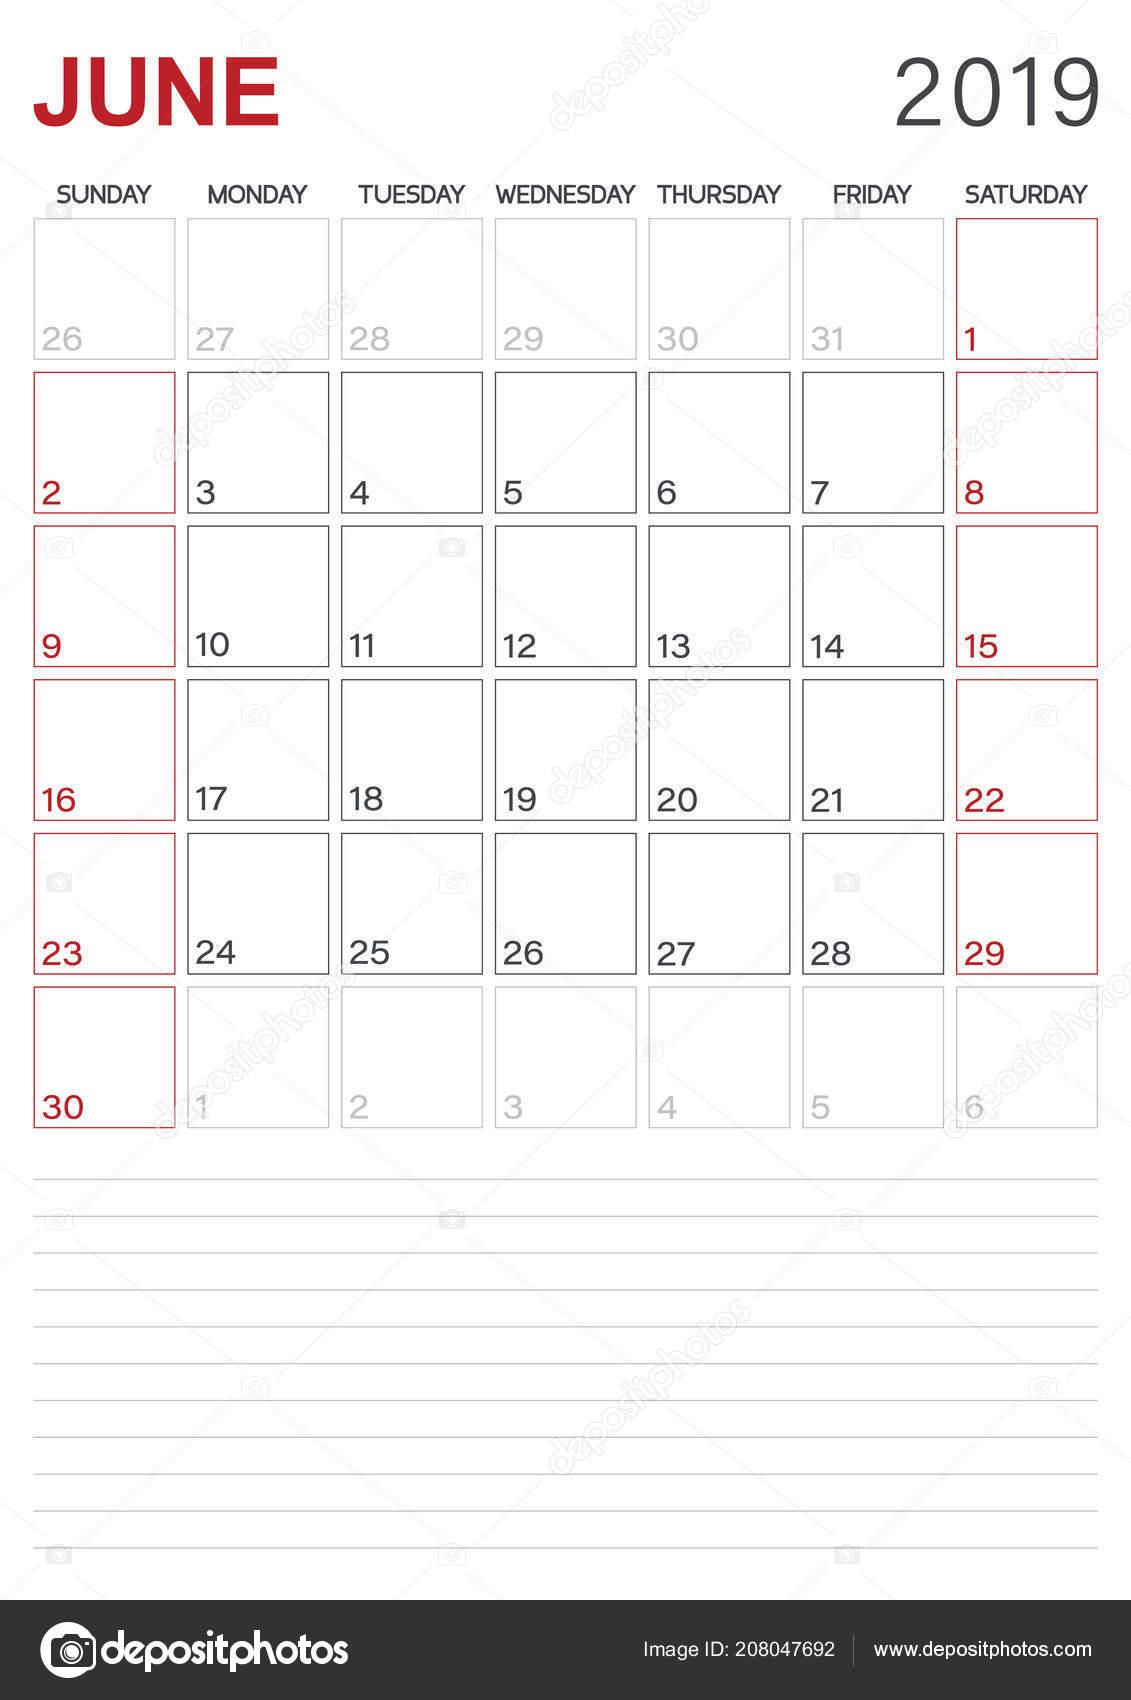 English Calendar 2019 Monthly Planner Calendar June 2019 Week Starts